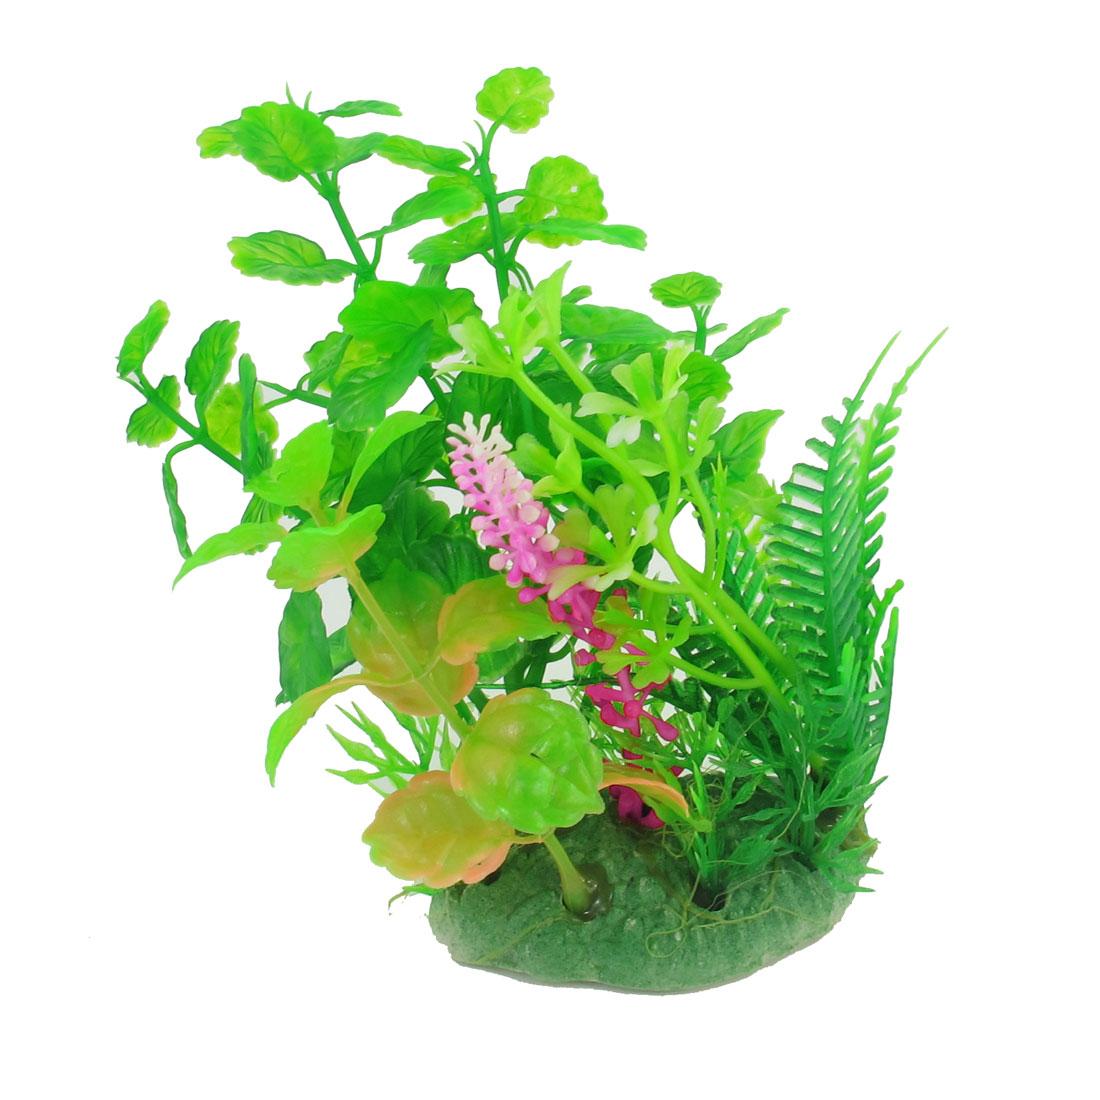 "5.1"" Height Green Artificial Manmade Aquarium Decoration Grass Plant"